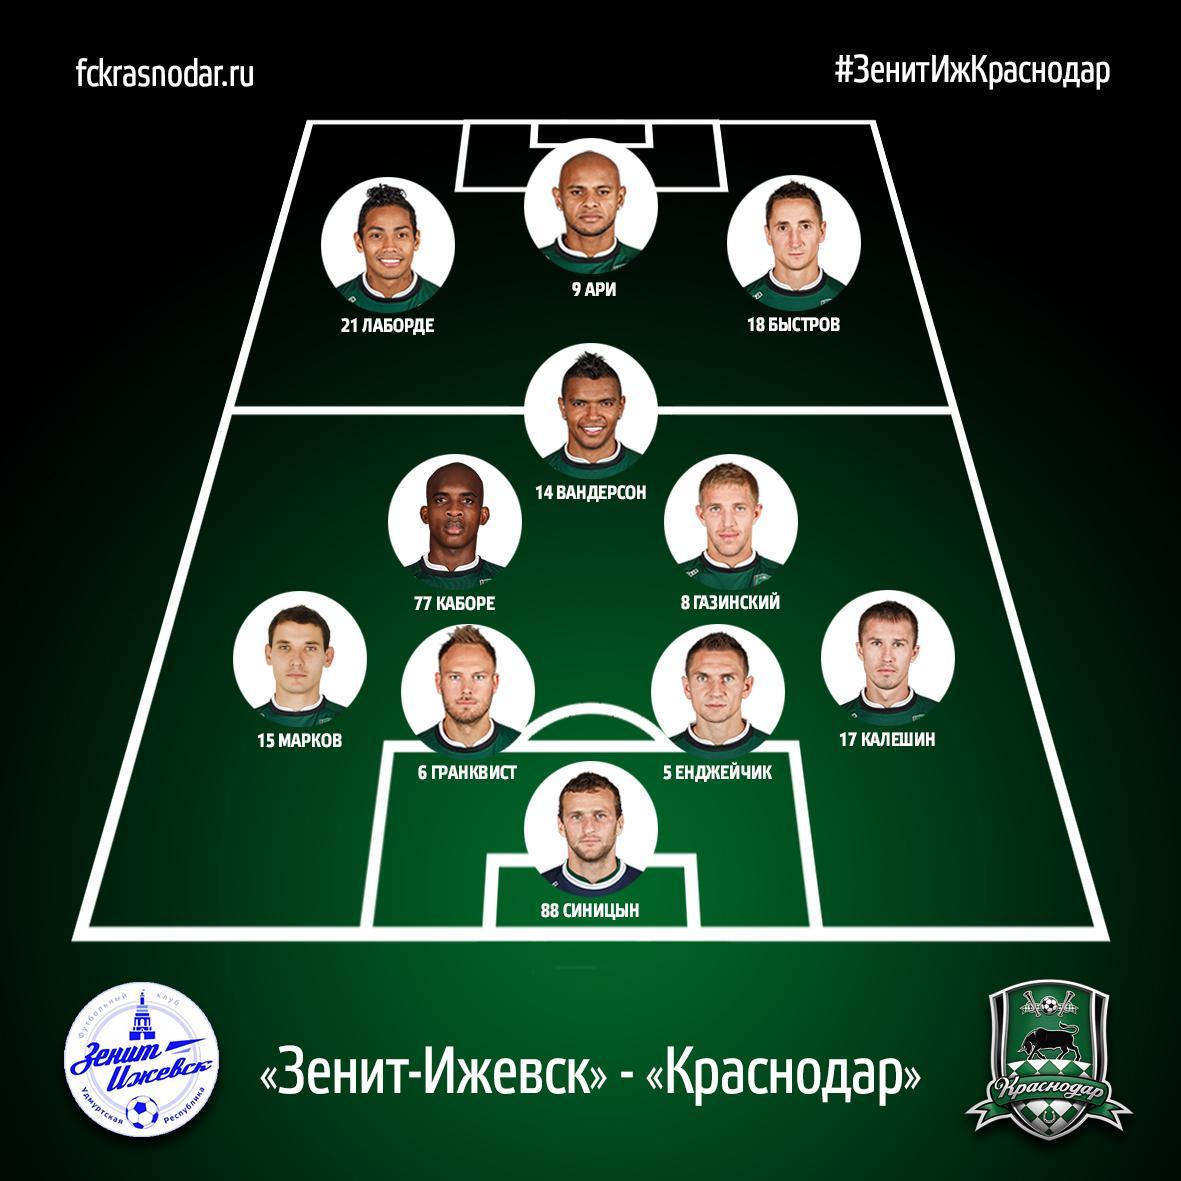 Каборе и Ари выйдут в старте «Краснодара» в матче против «Зенита» из Ижевска